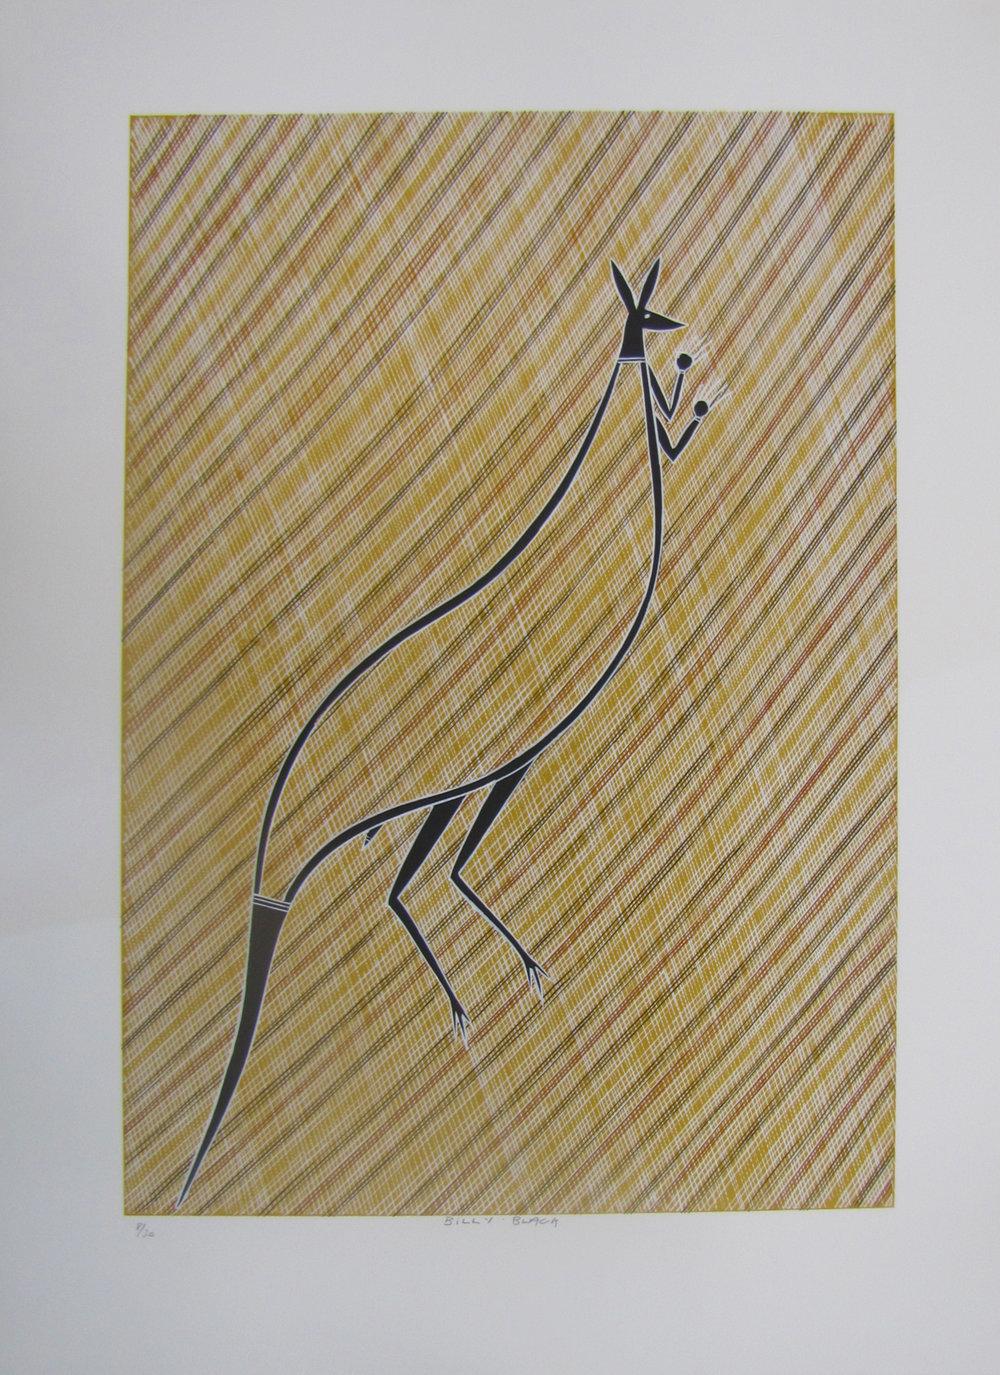 Billy Black, Wallaby. 2016  Silkscreen. Edition 6/30   59.5 x 42 cm   $350 (unframed)   $550 (framed) SOLD